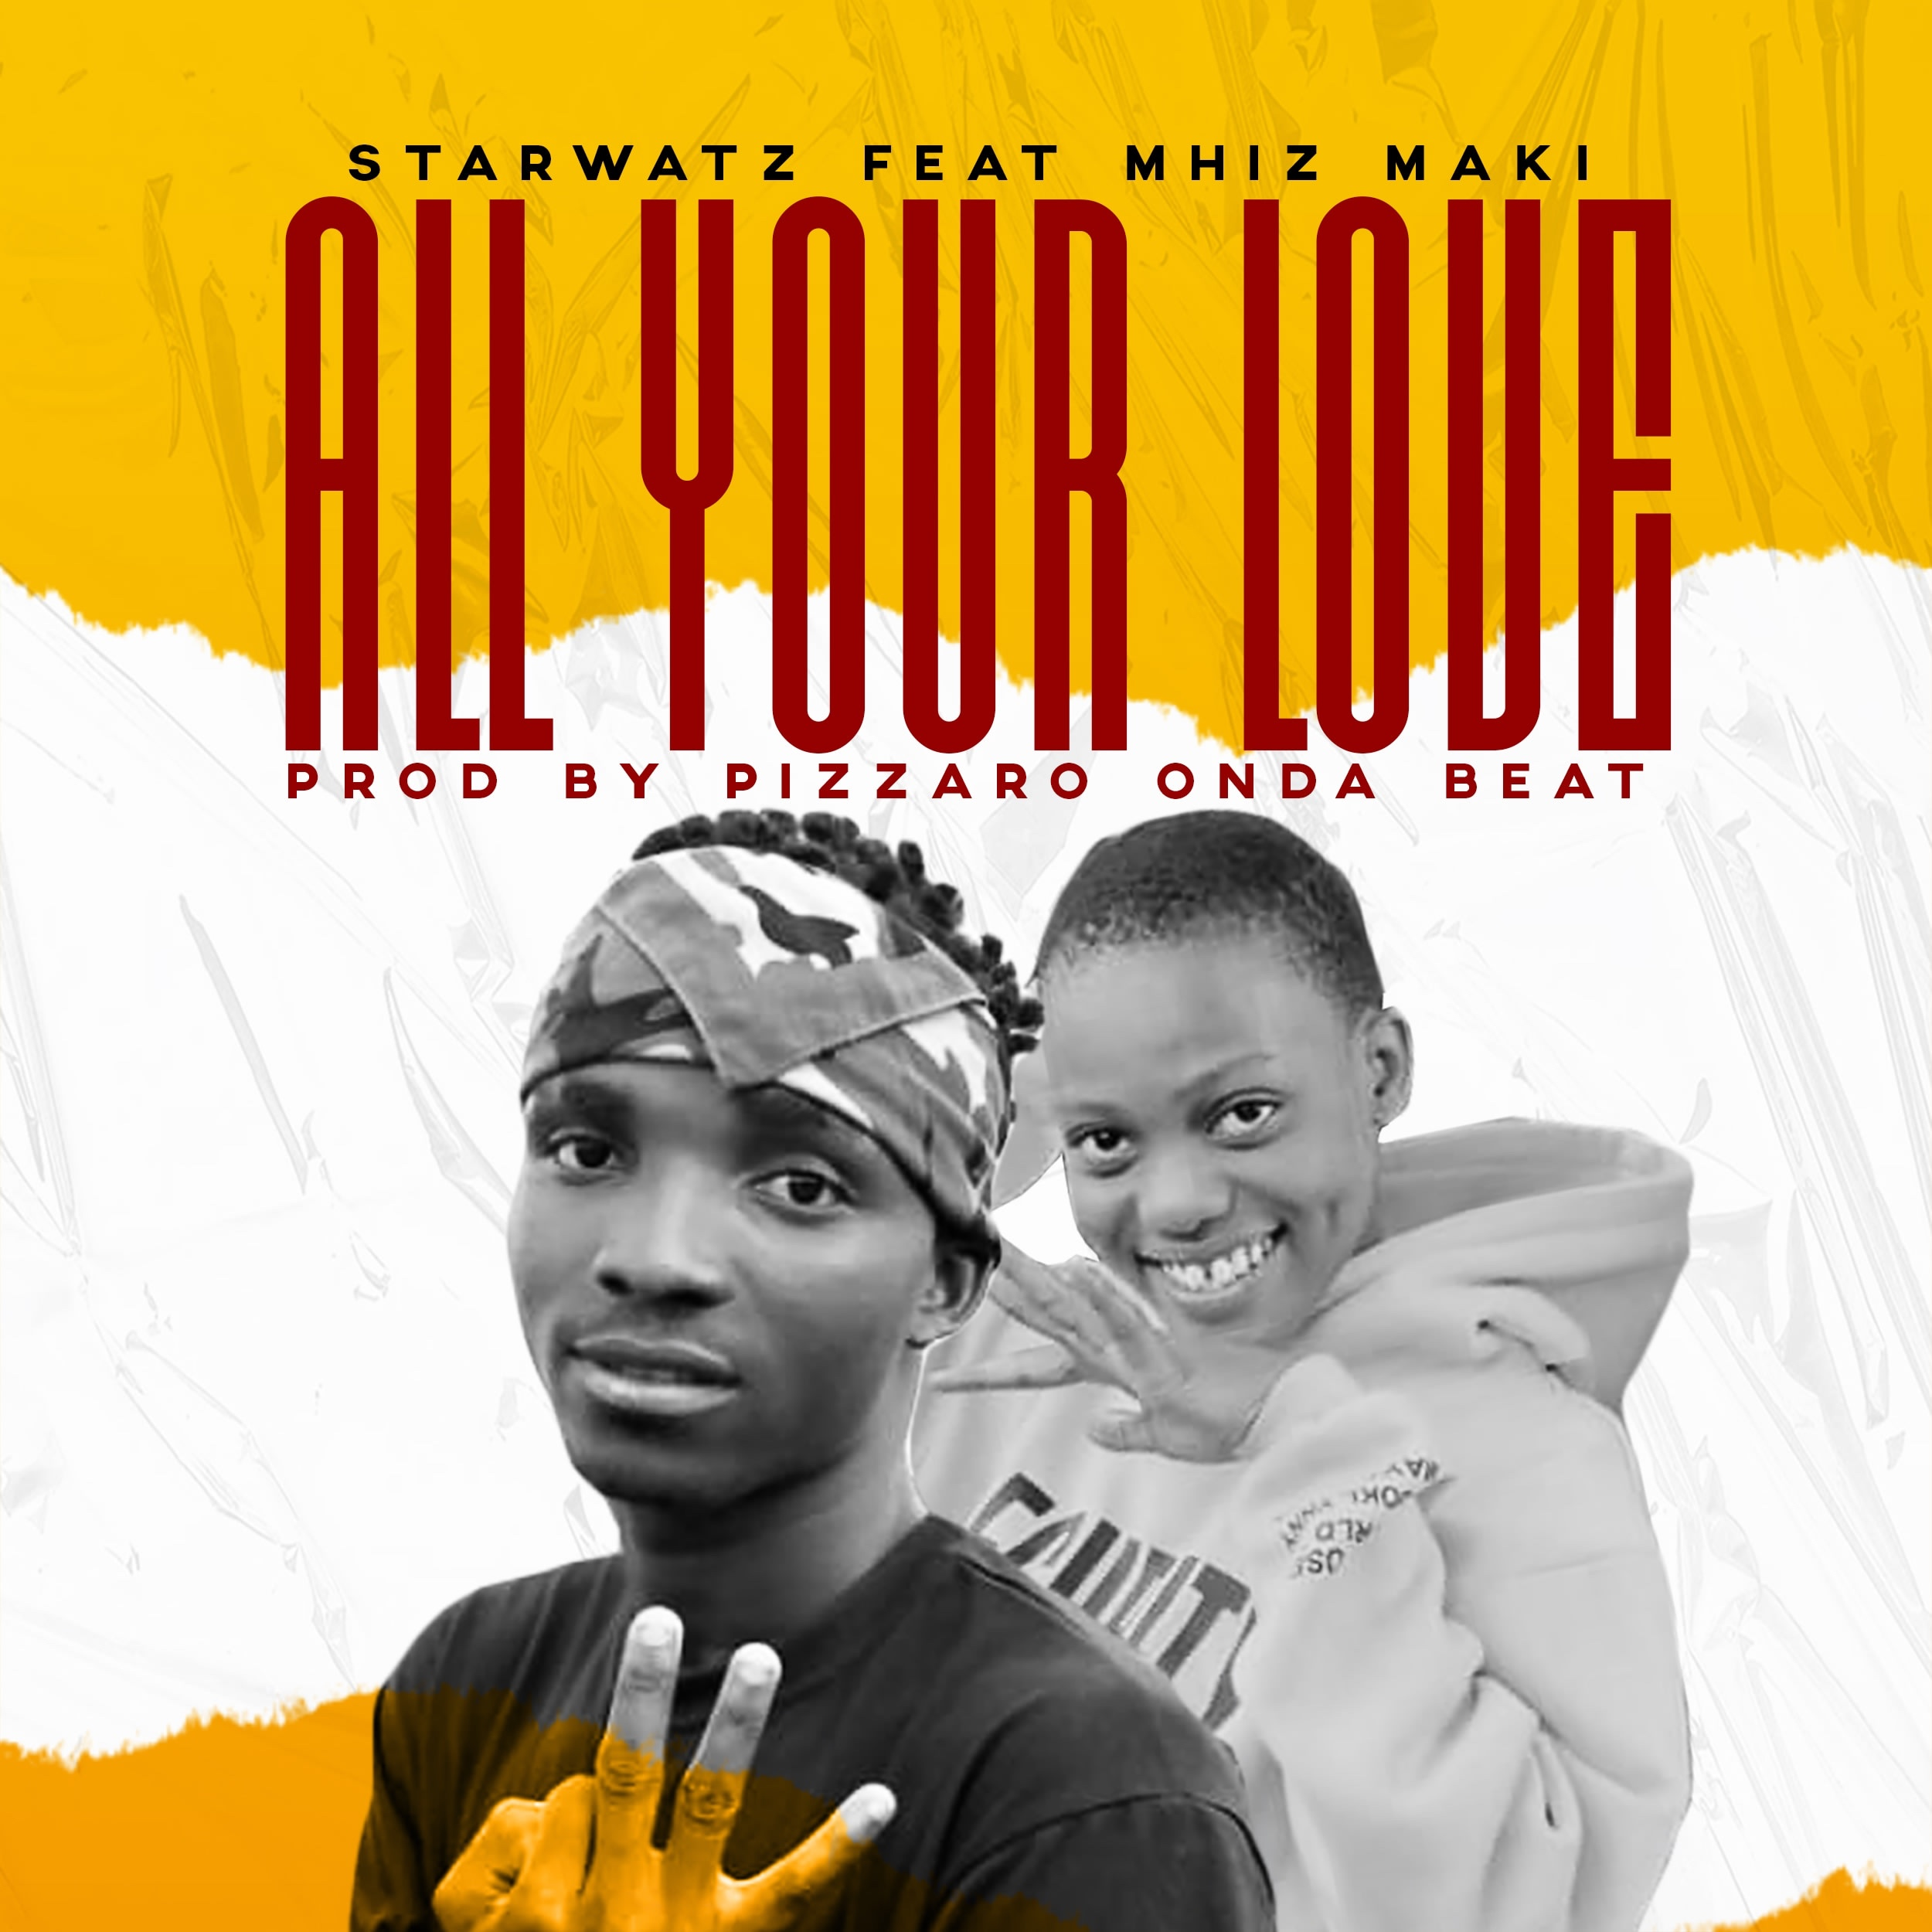 StarWatz ft Mhiz Maki - All Your Love